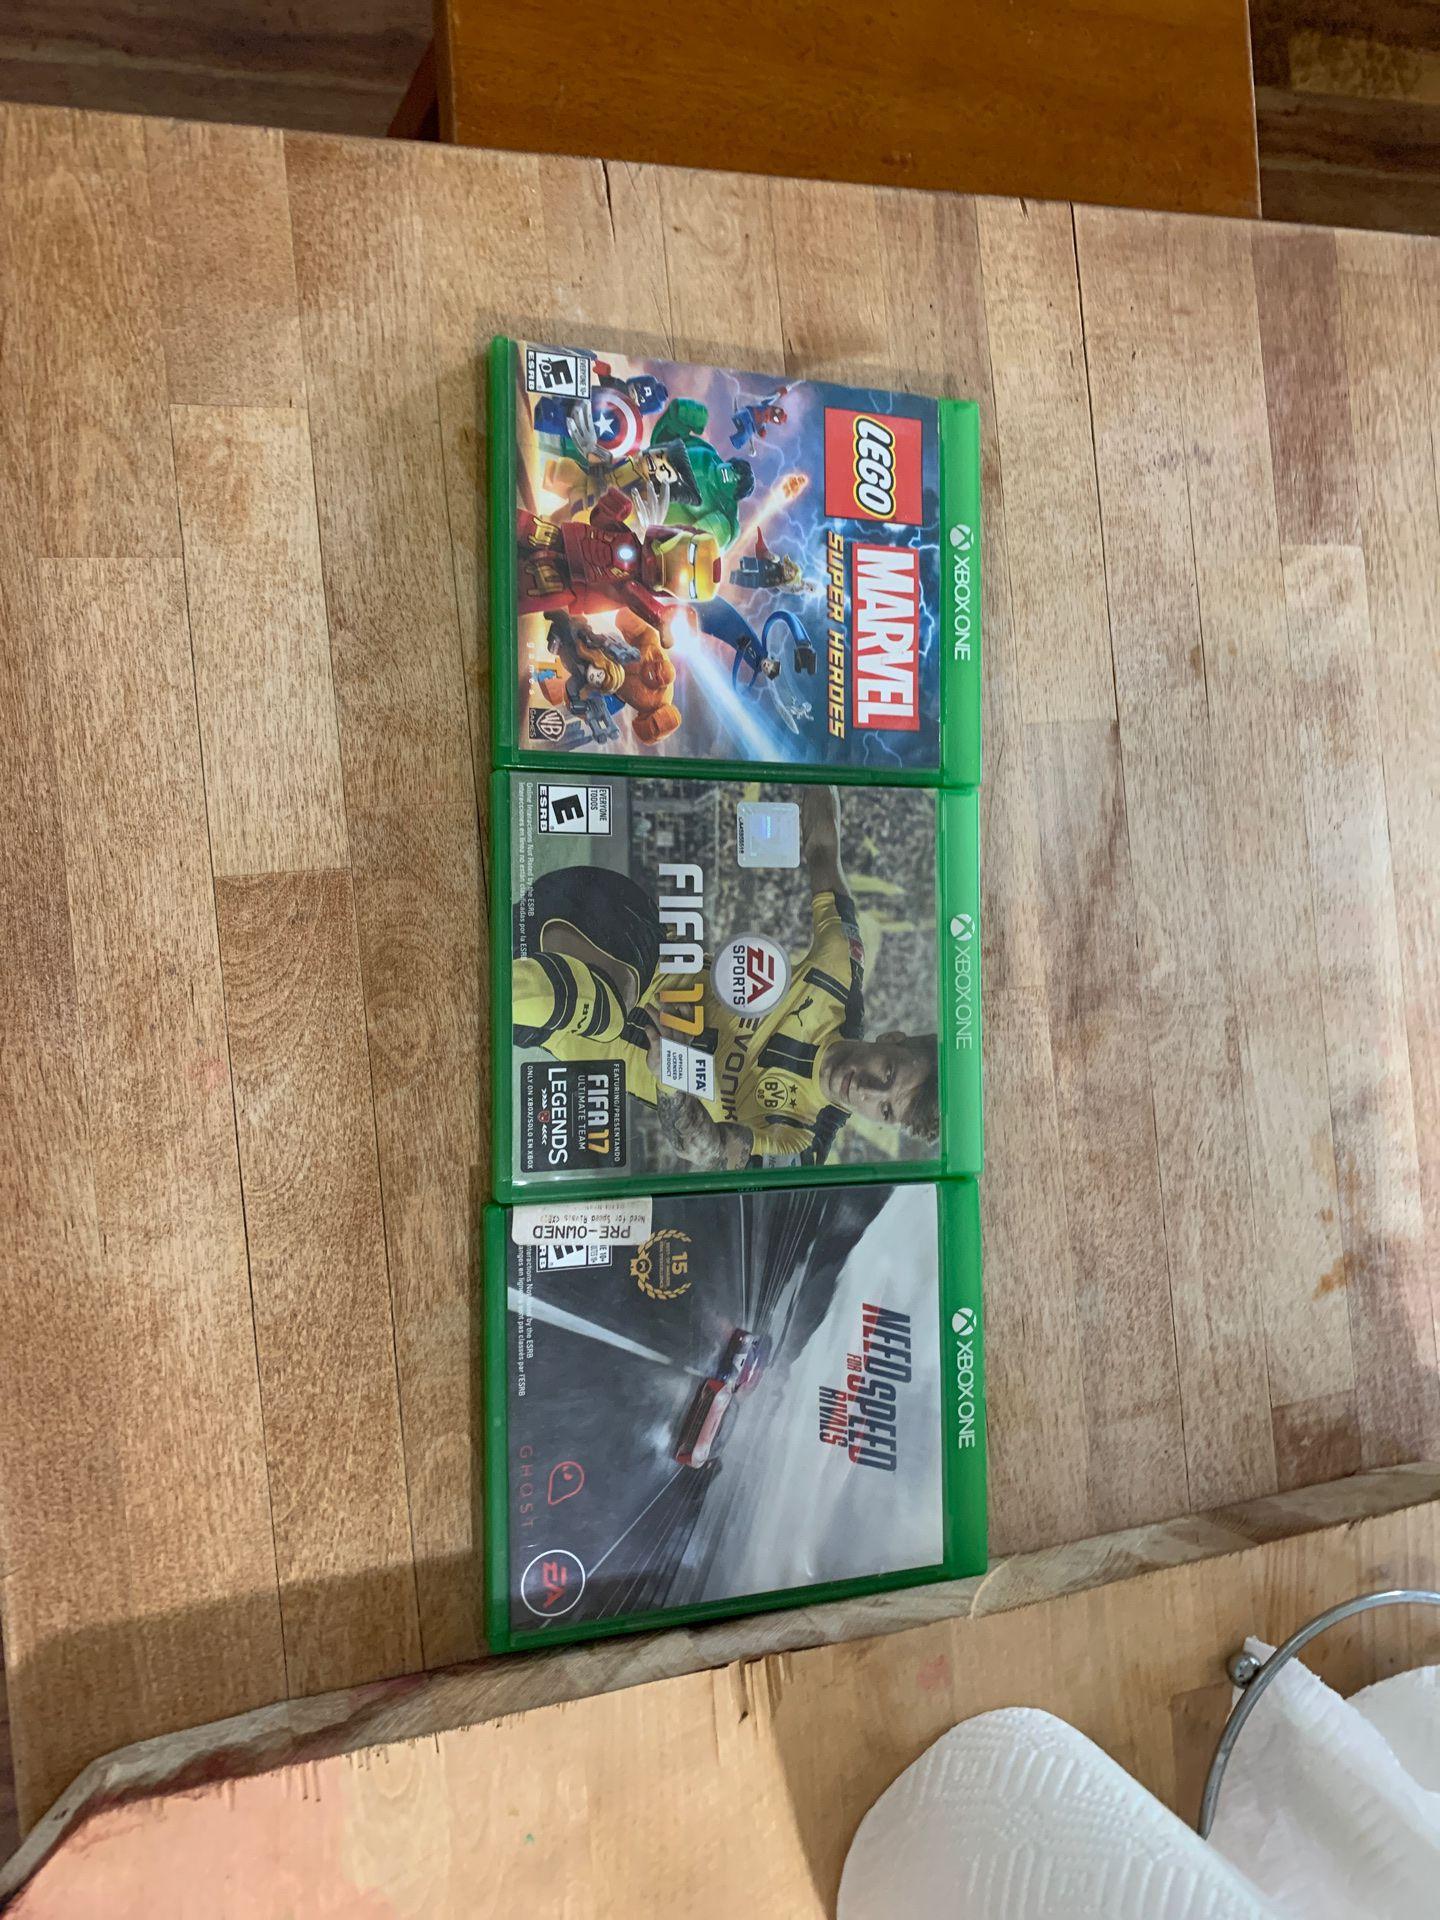 LEGO marvel. Fifa 17. Need for speed